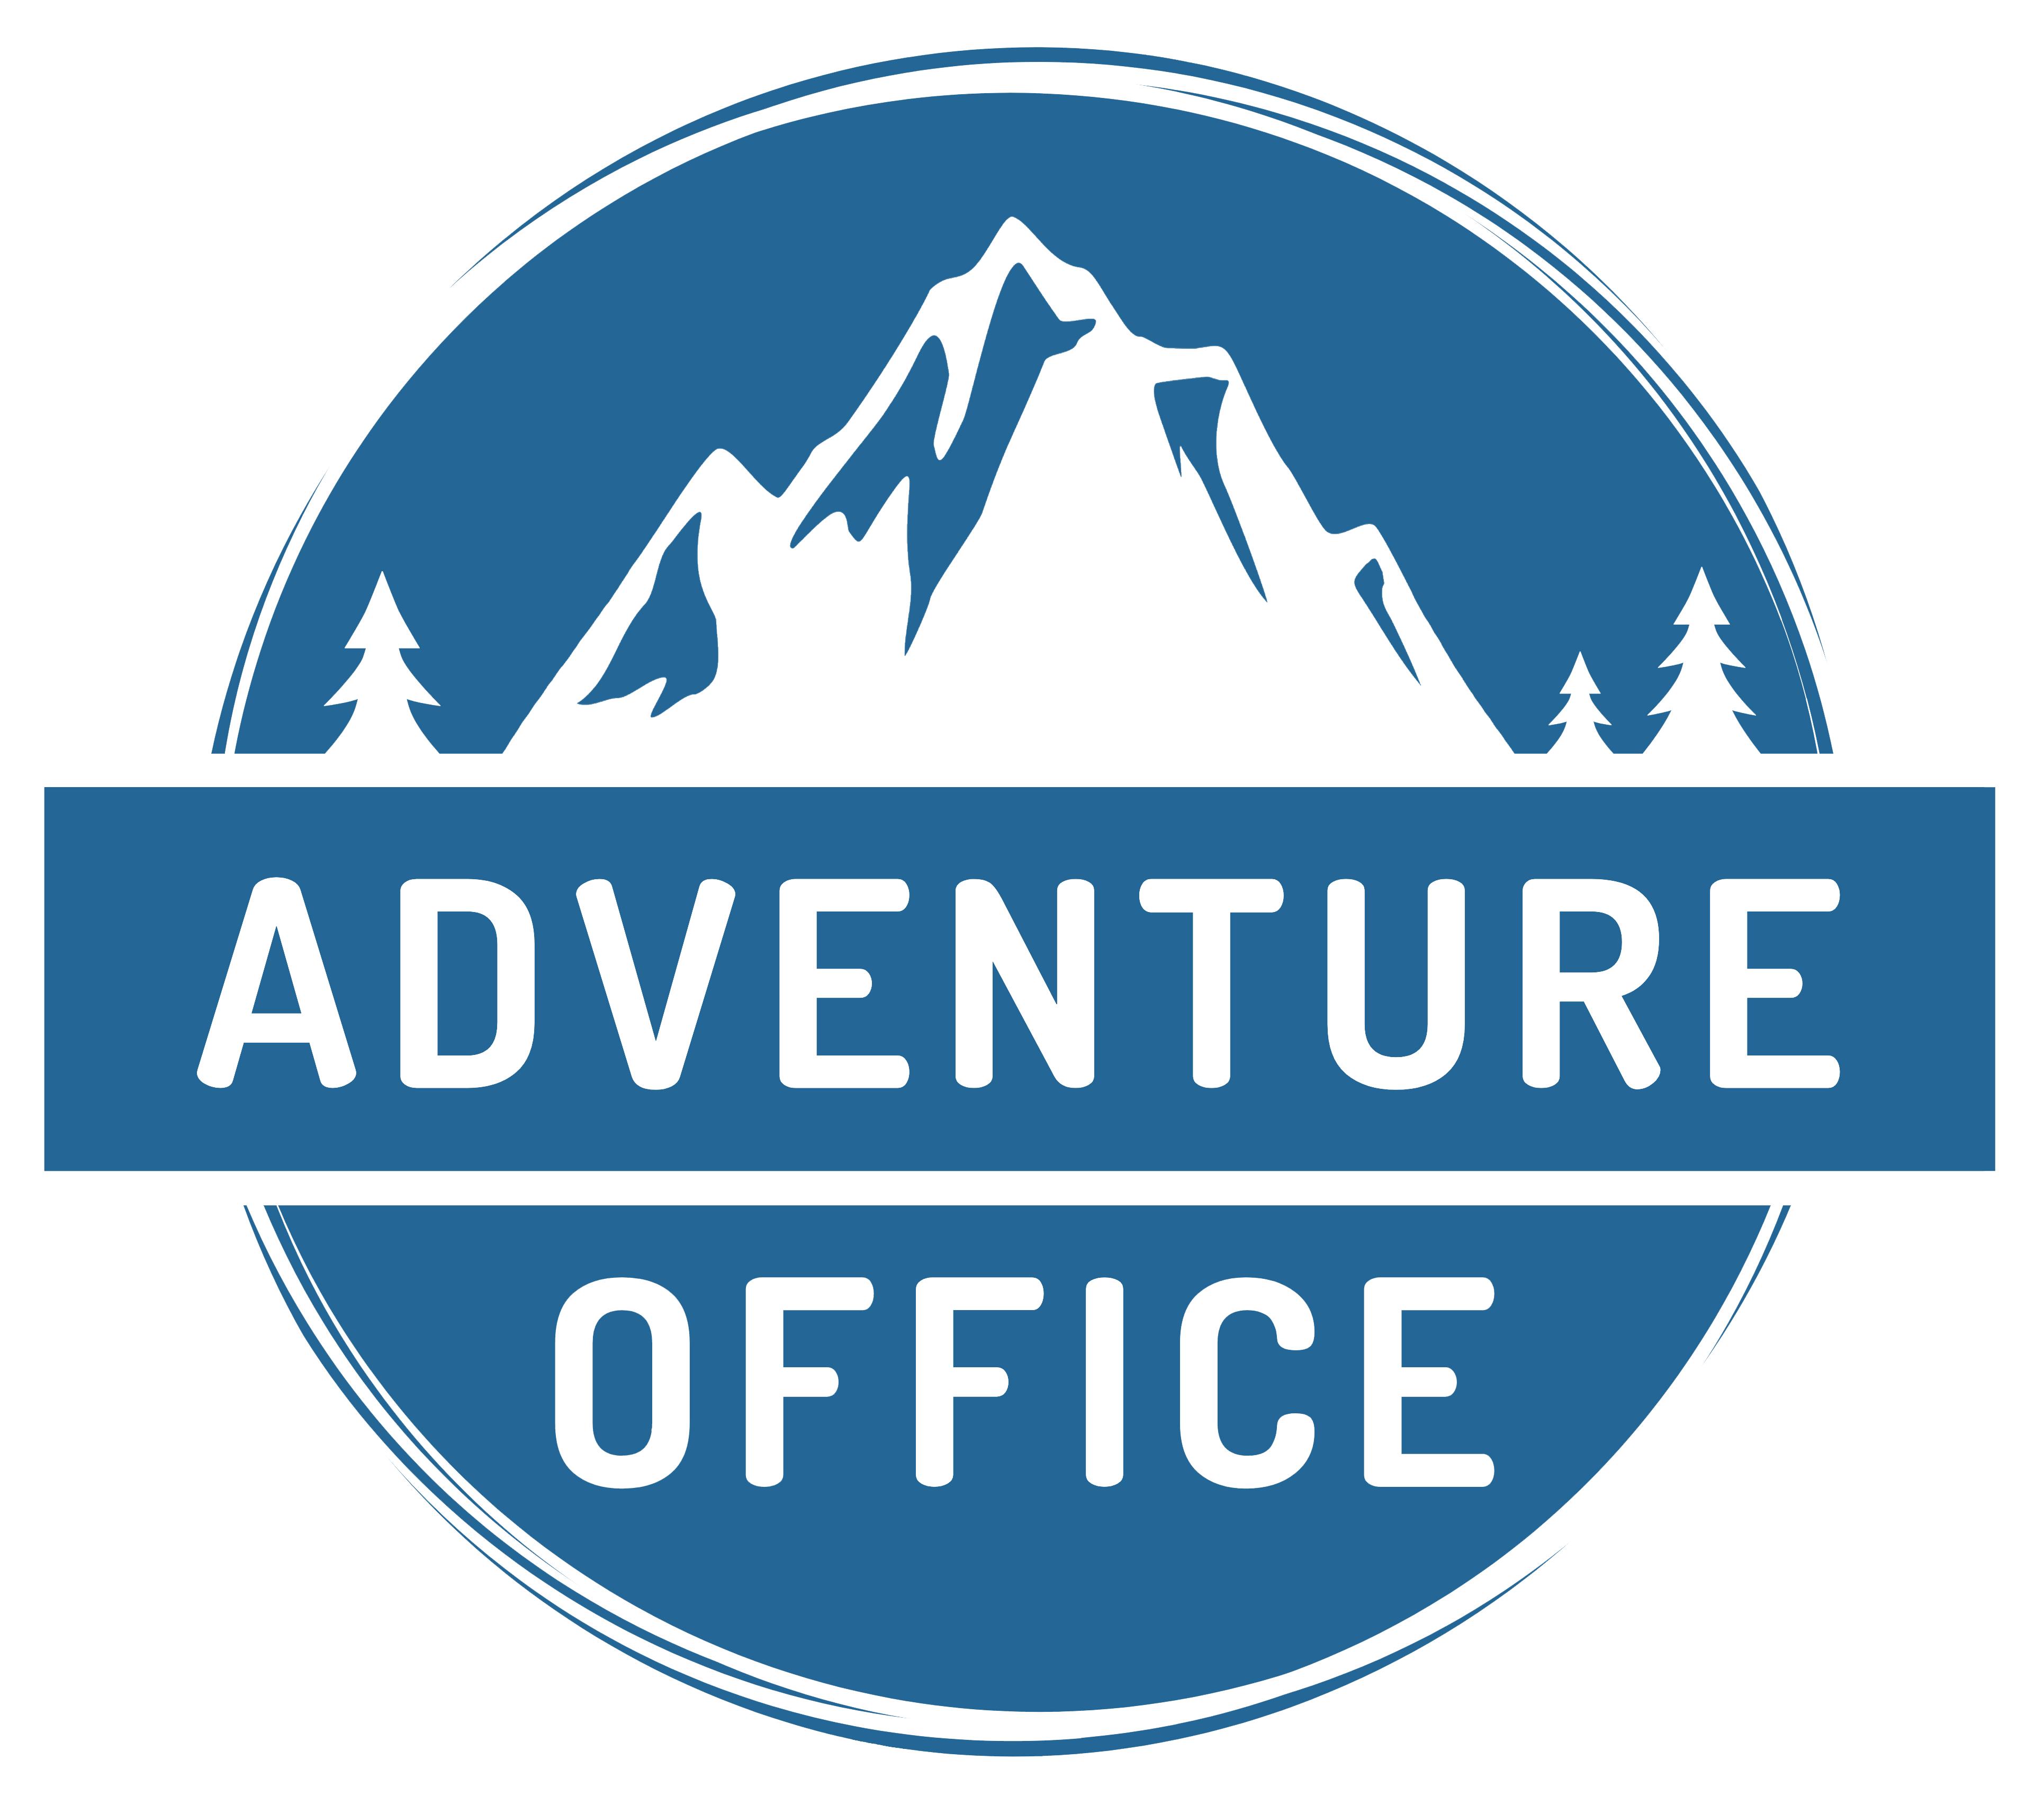 Adventure Office